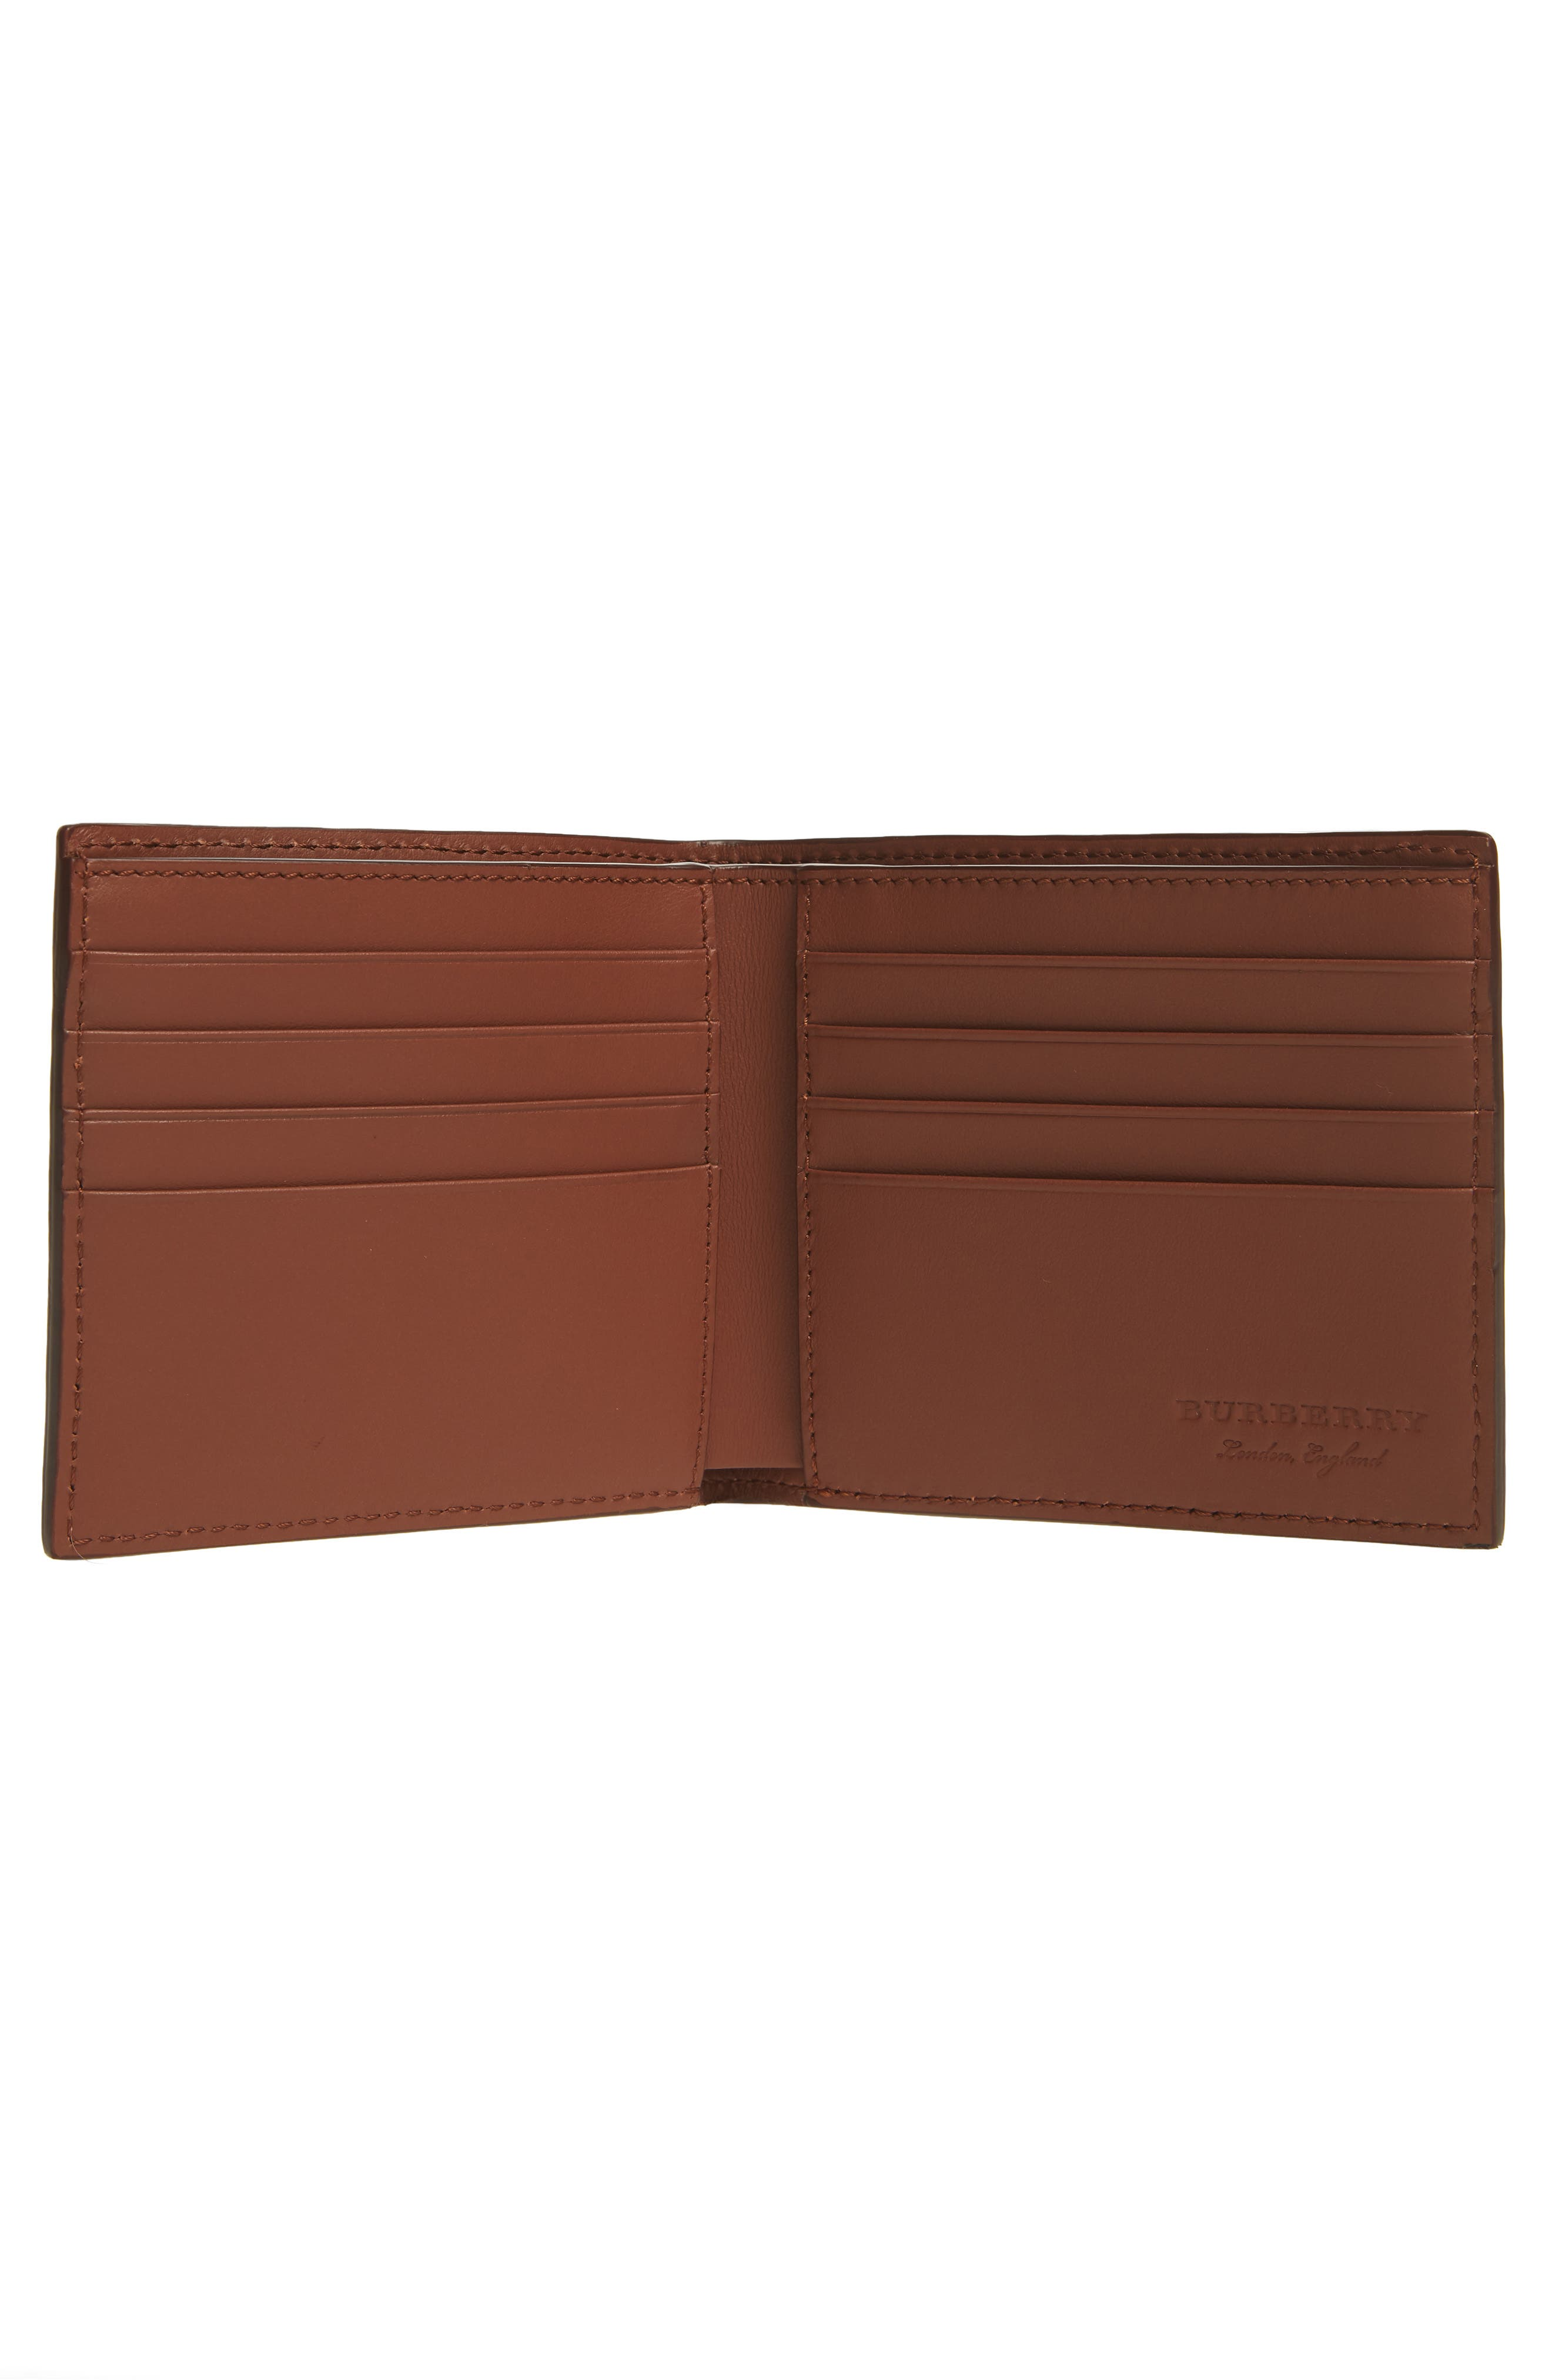 Billfold Wallet,                             Alternate thumbnail 2, color,                             Chestnut Brown